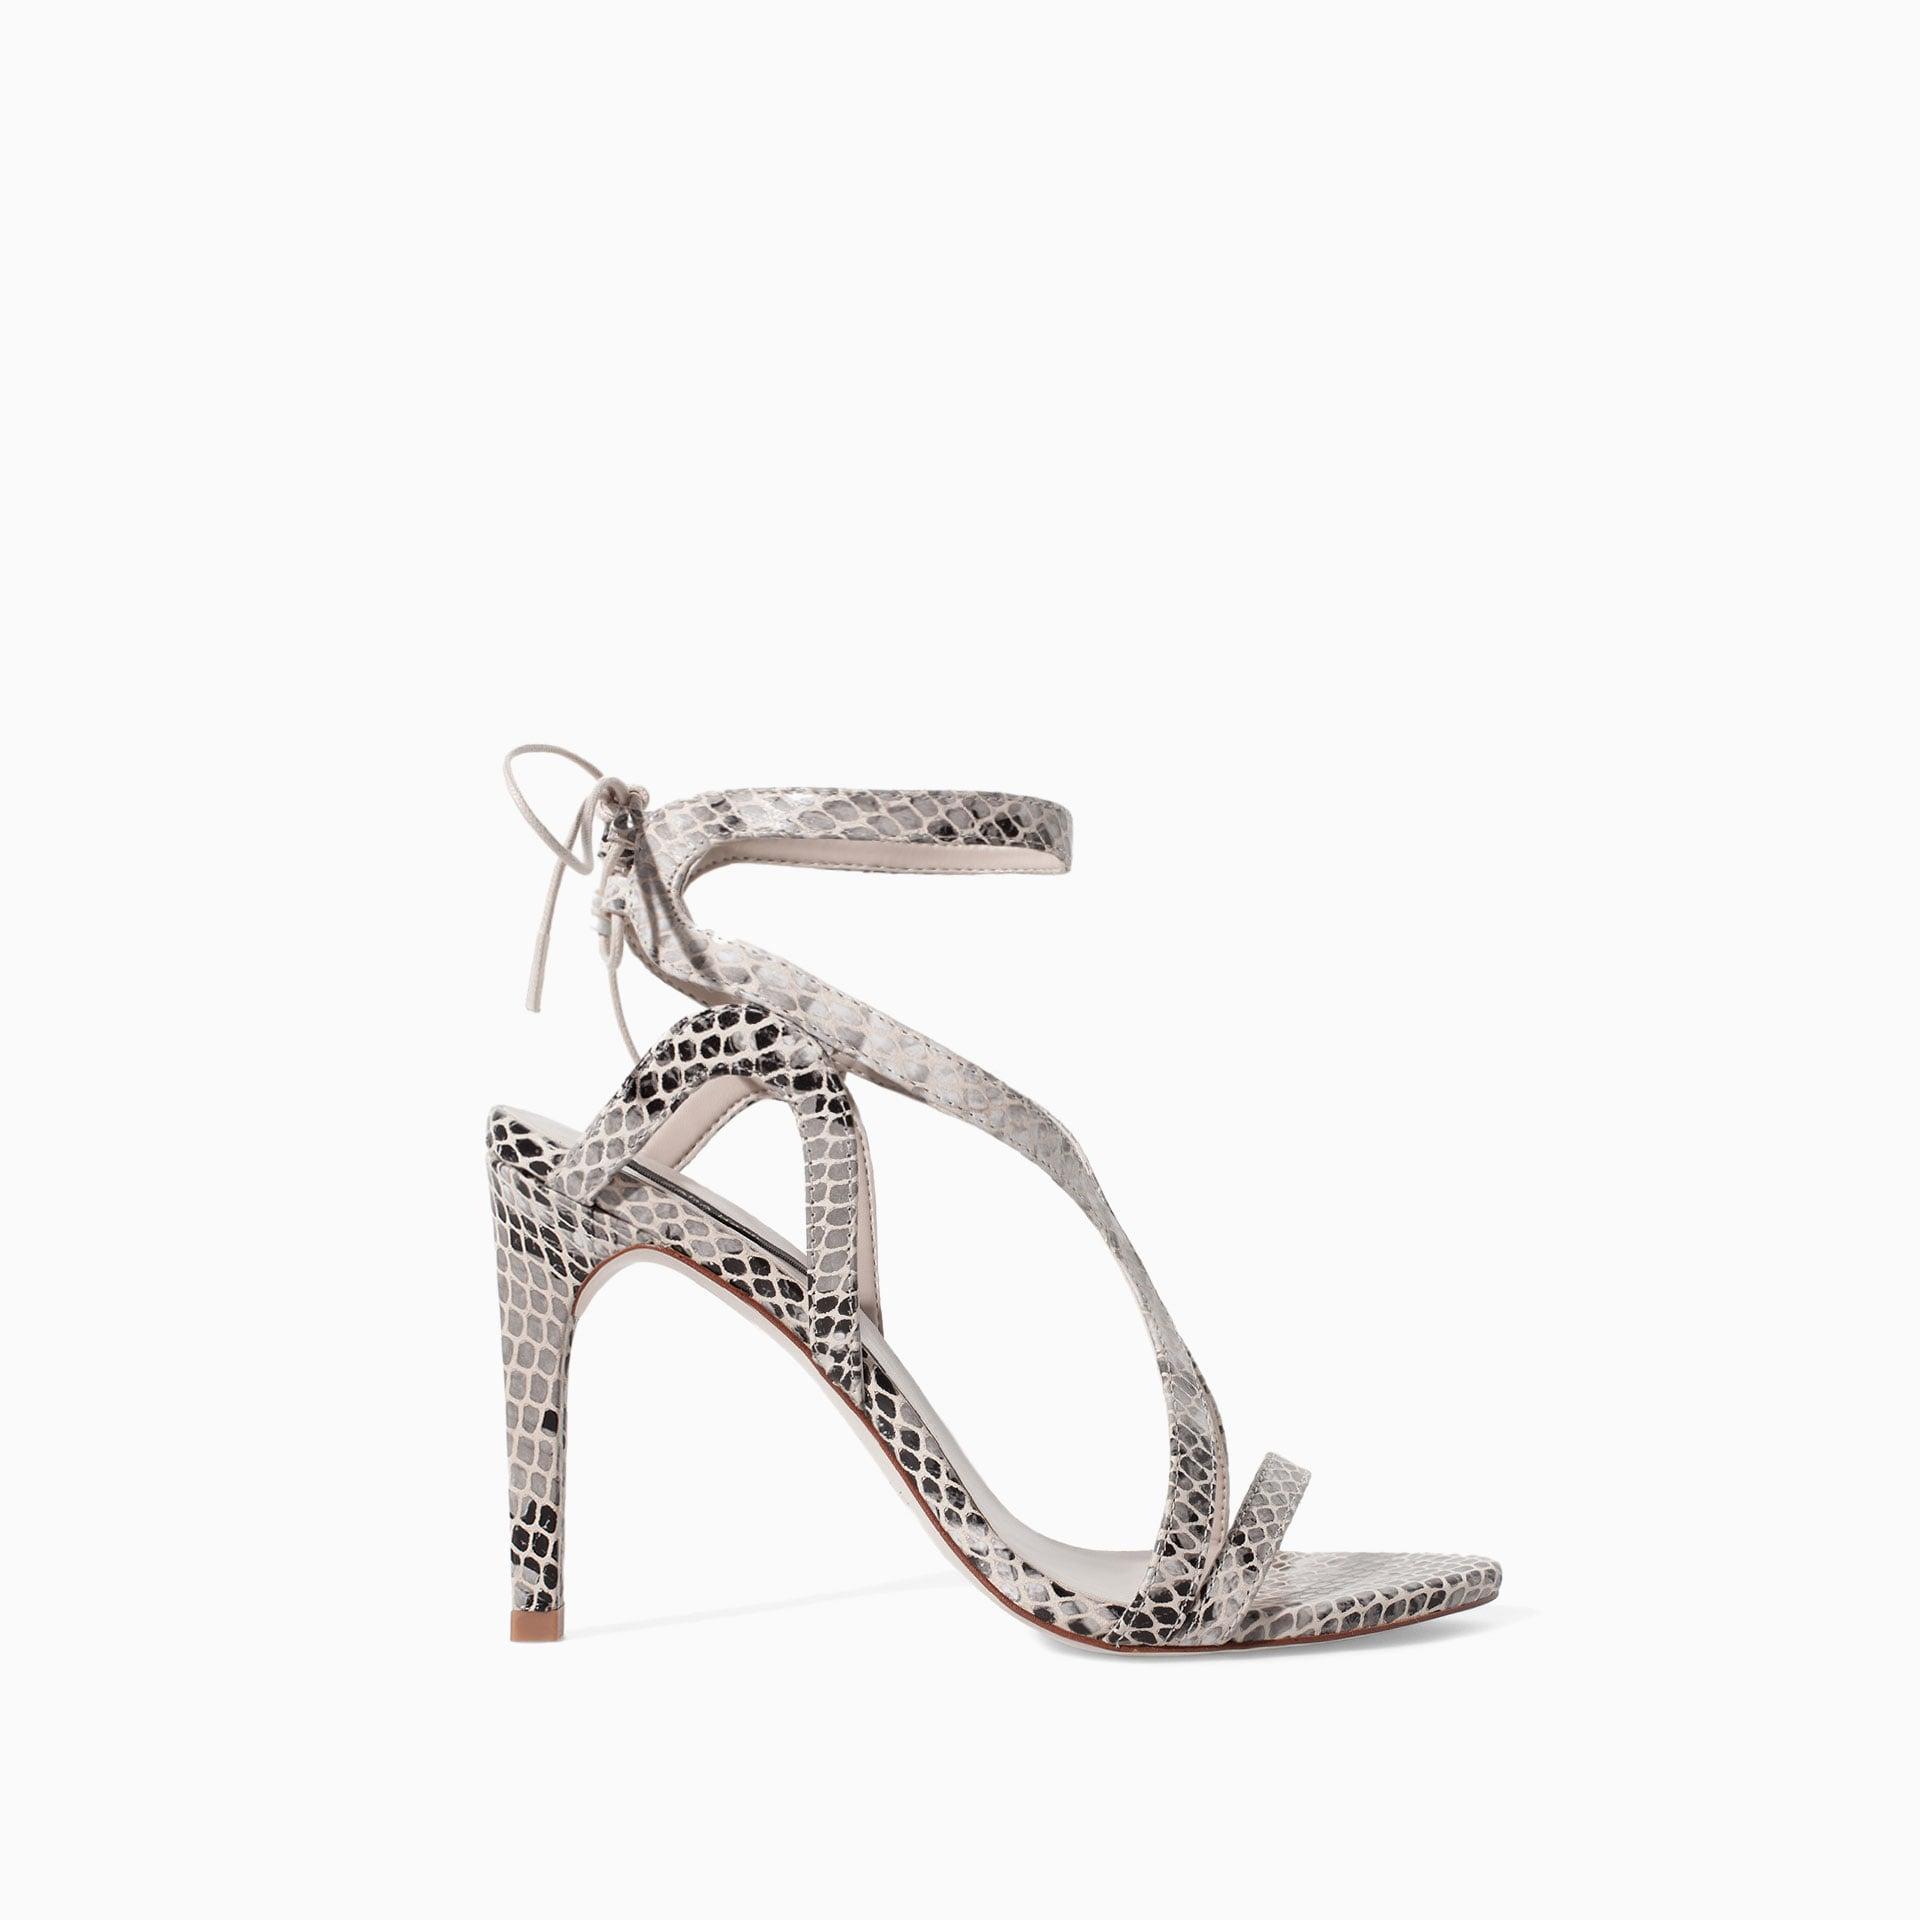 Zara High Heel Snake Print Leather Sandal ($100)